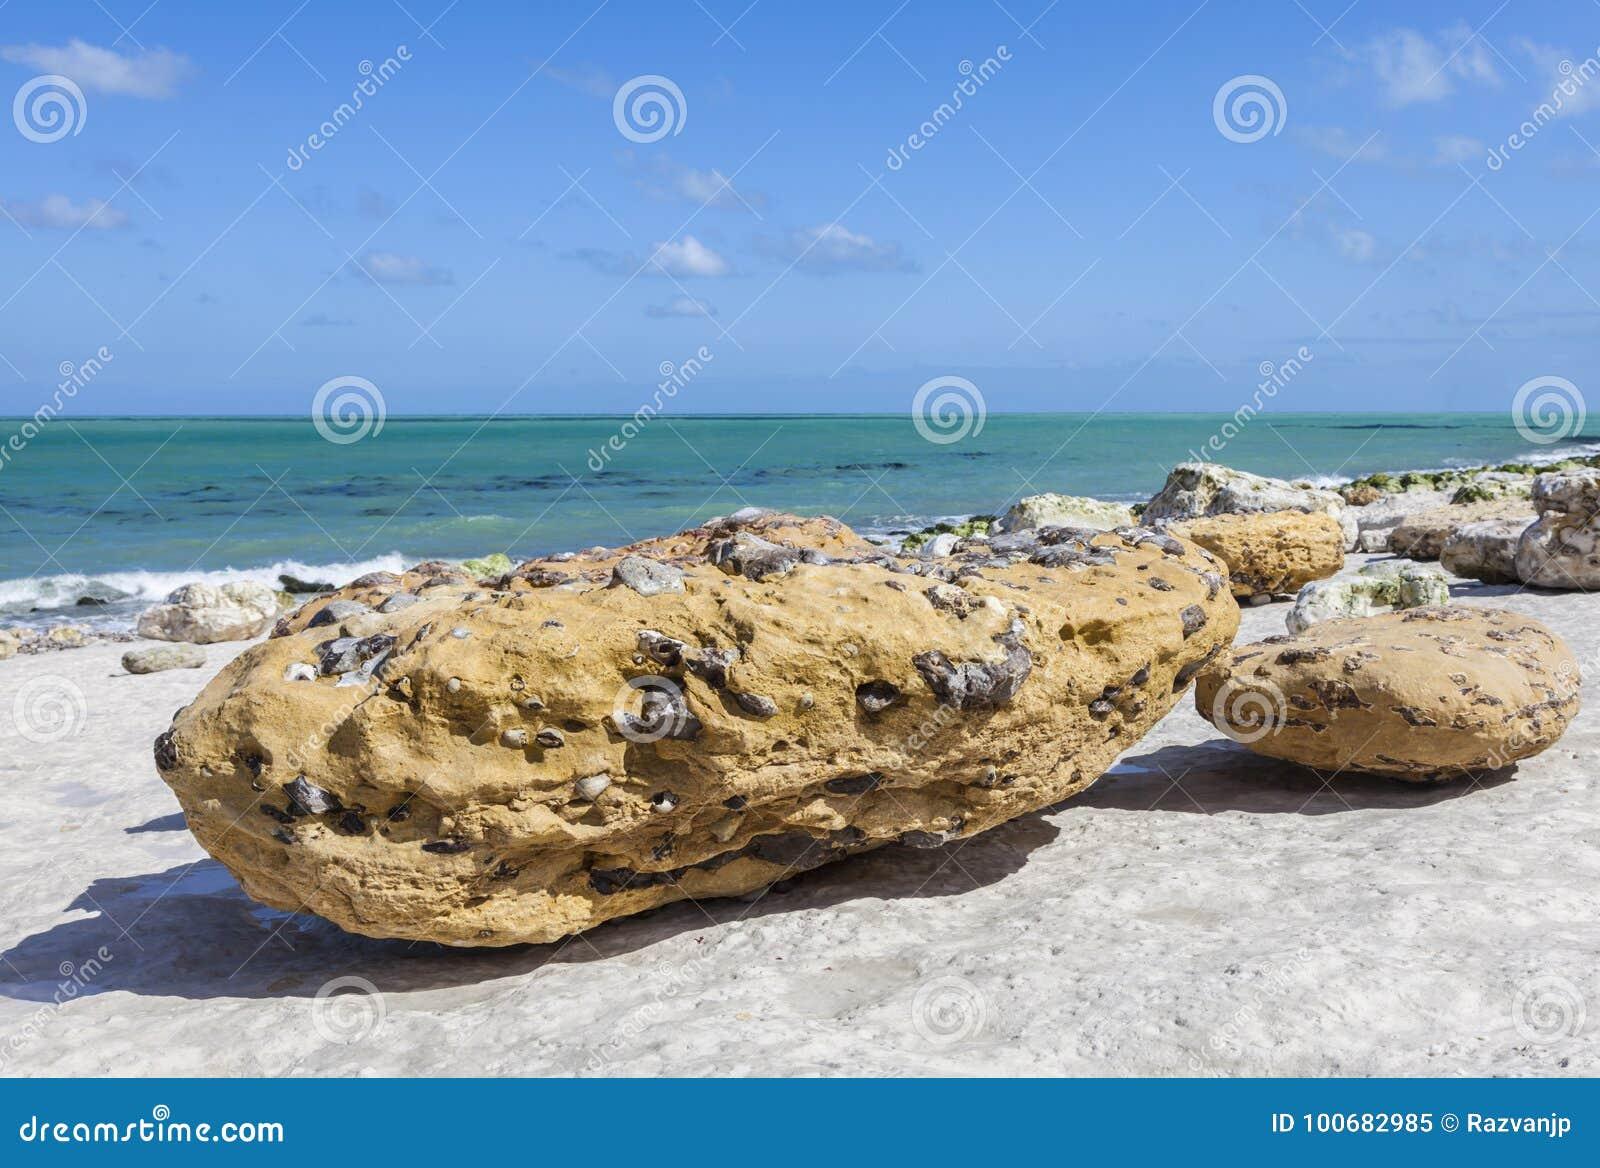 Rocky Beach Abstract